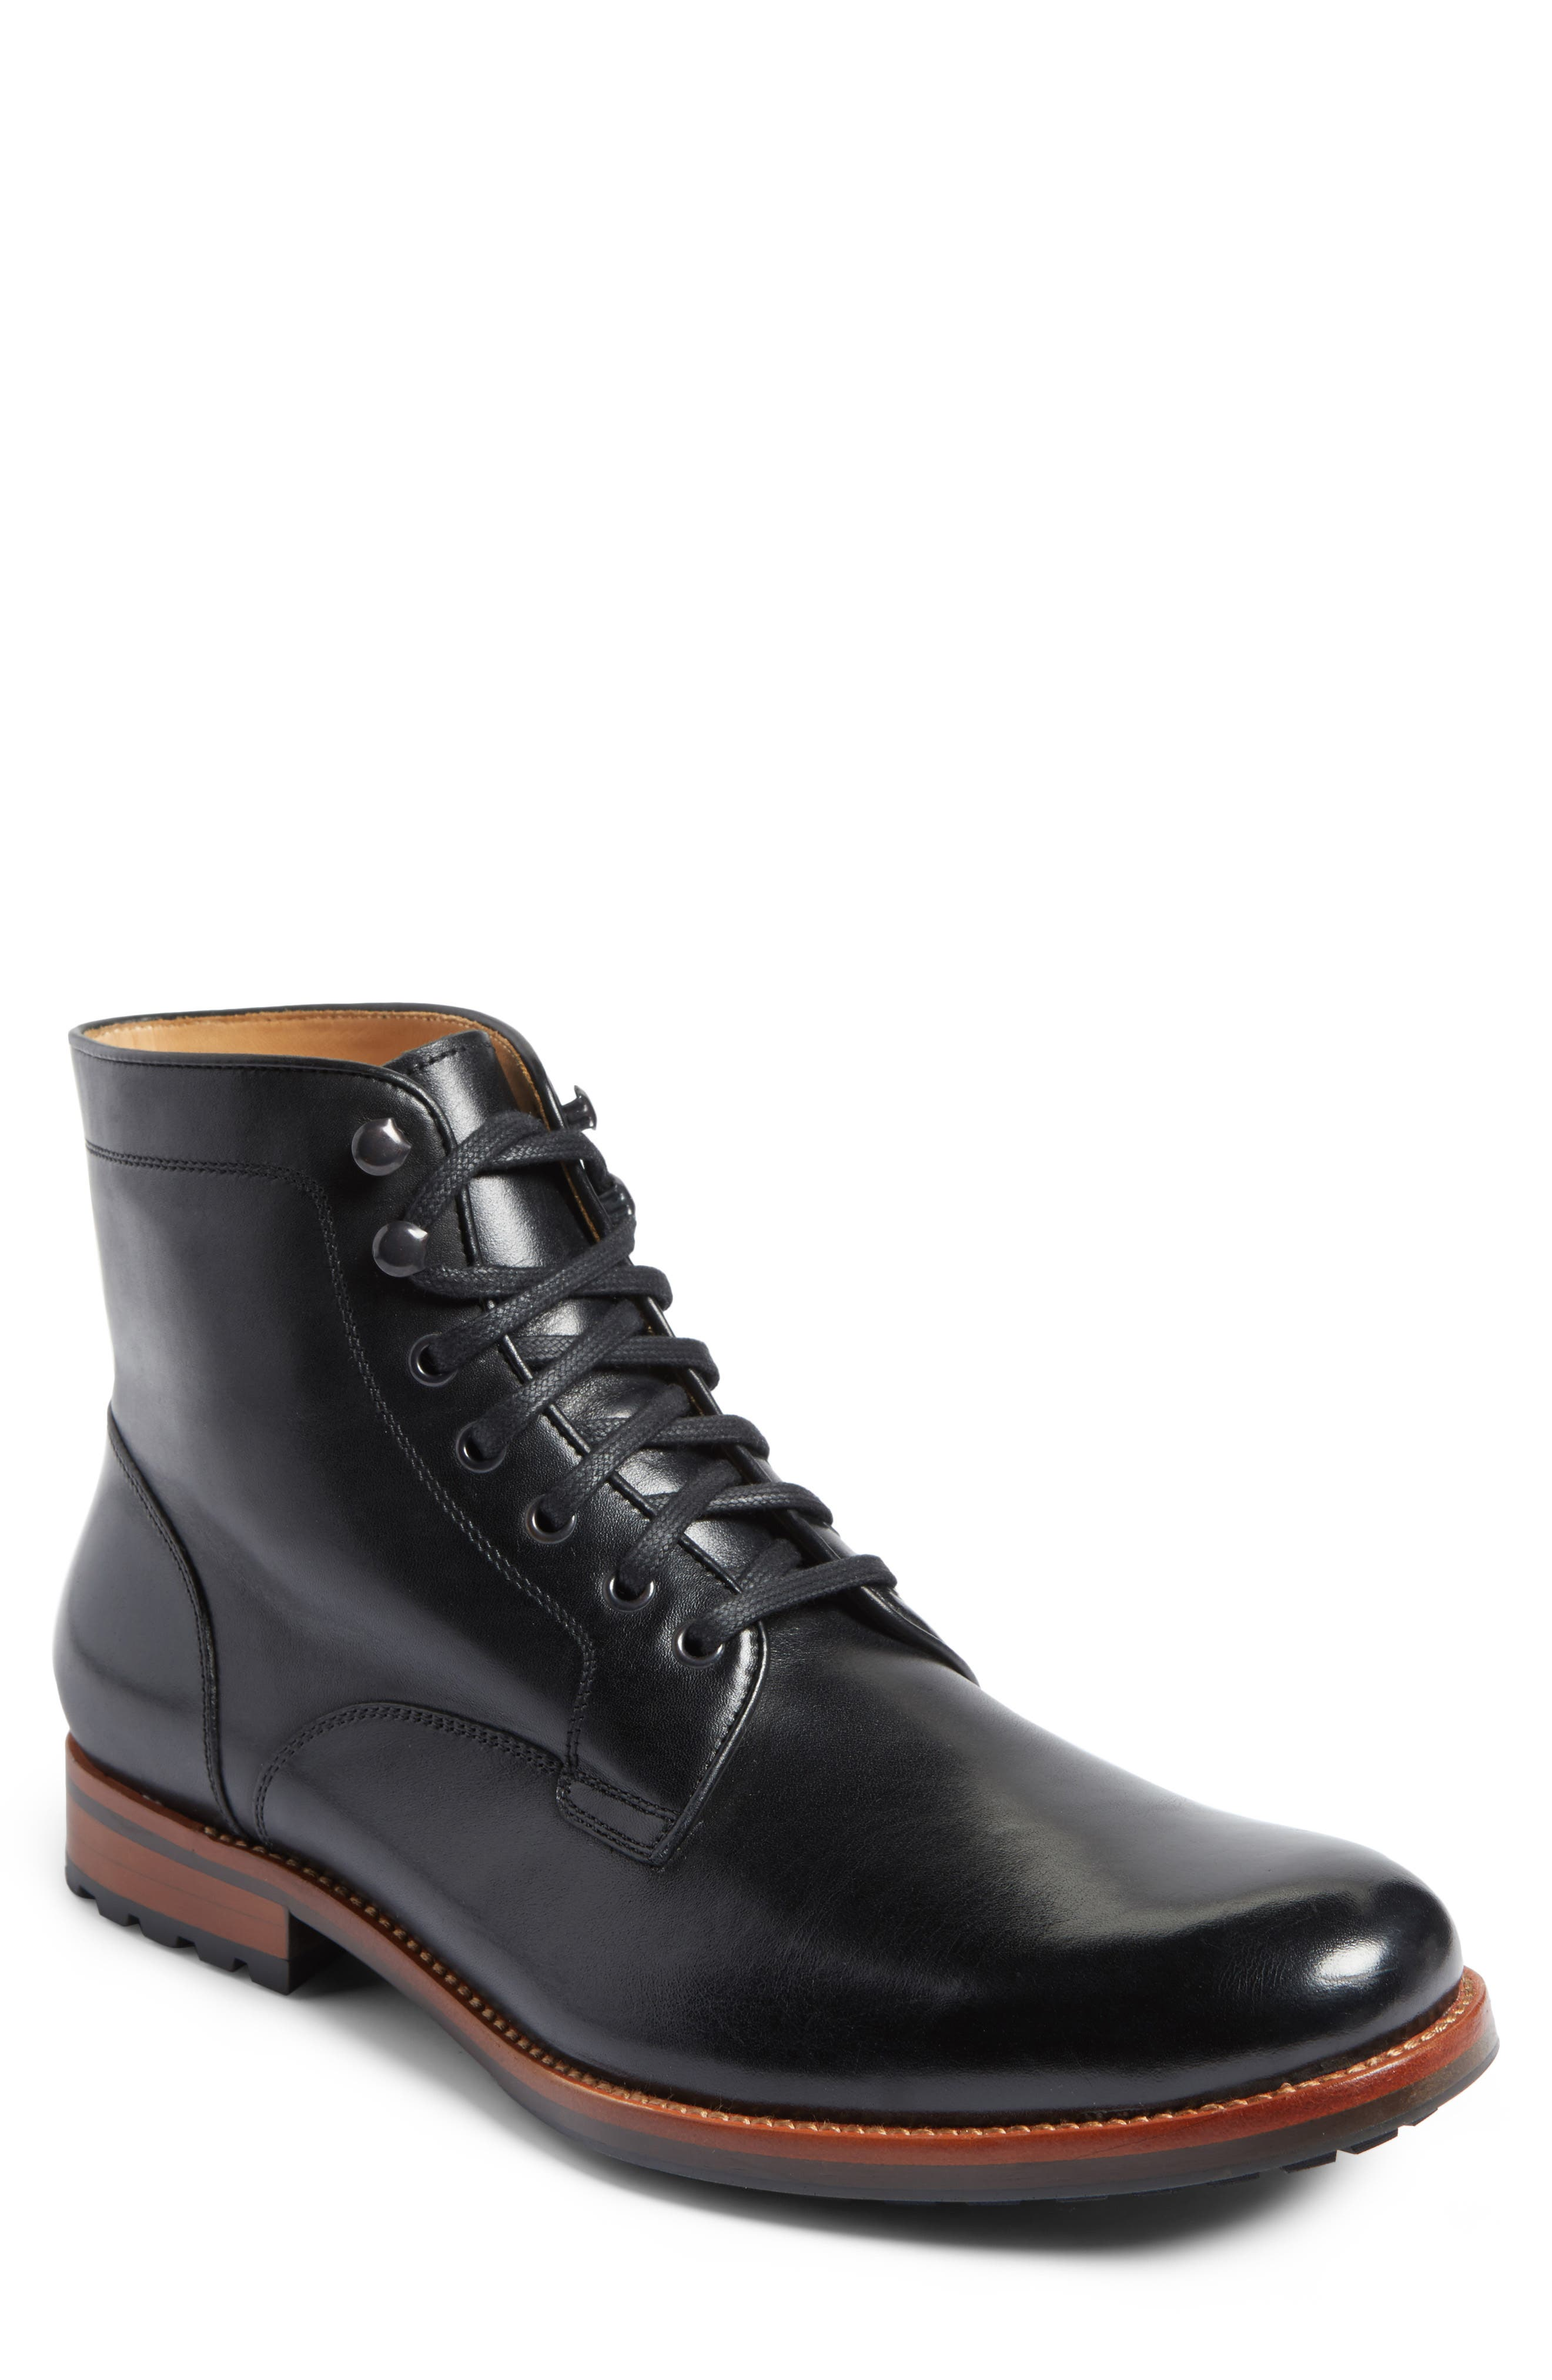 Axeford Plain Toe Boot,                         Main,                         color, 001